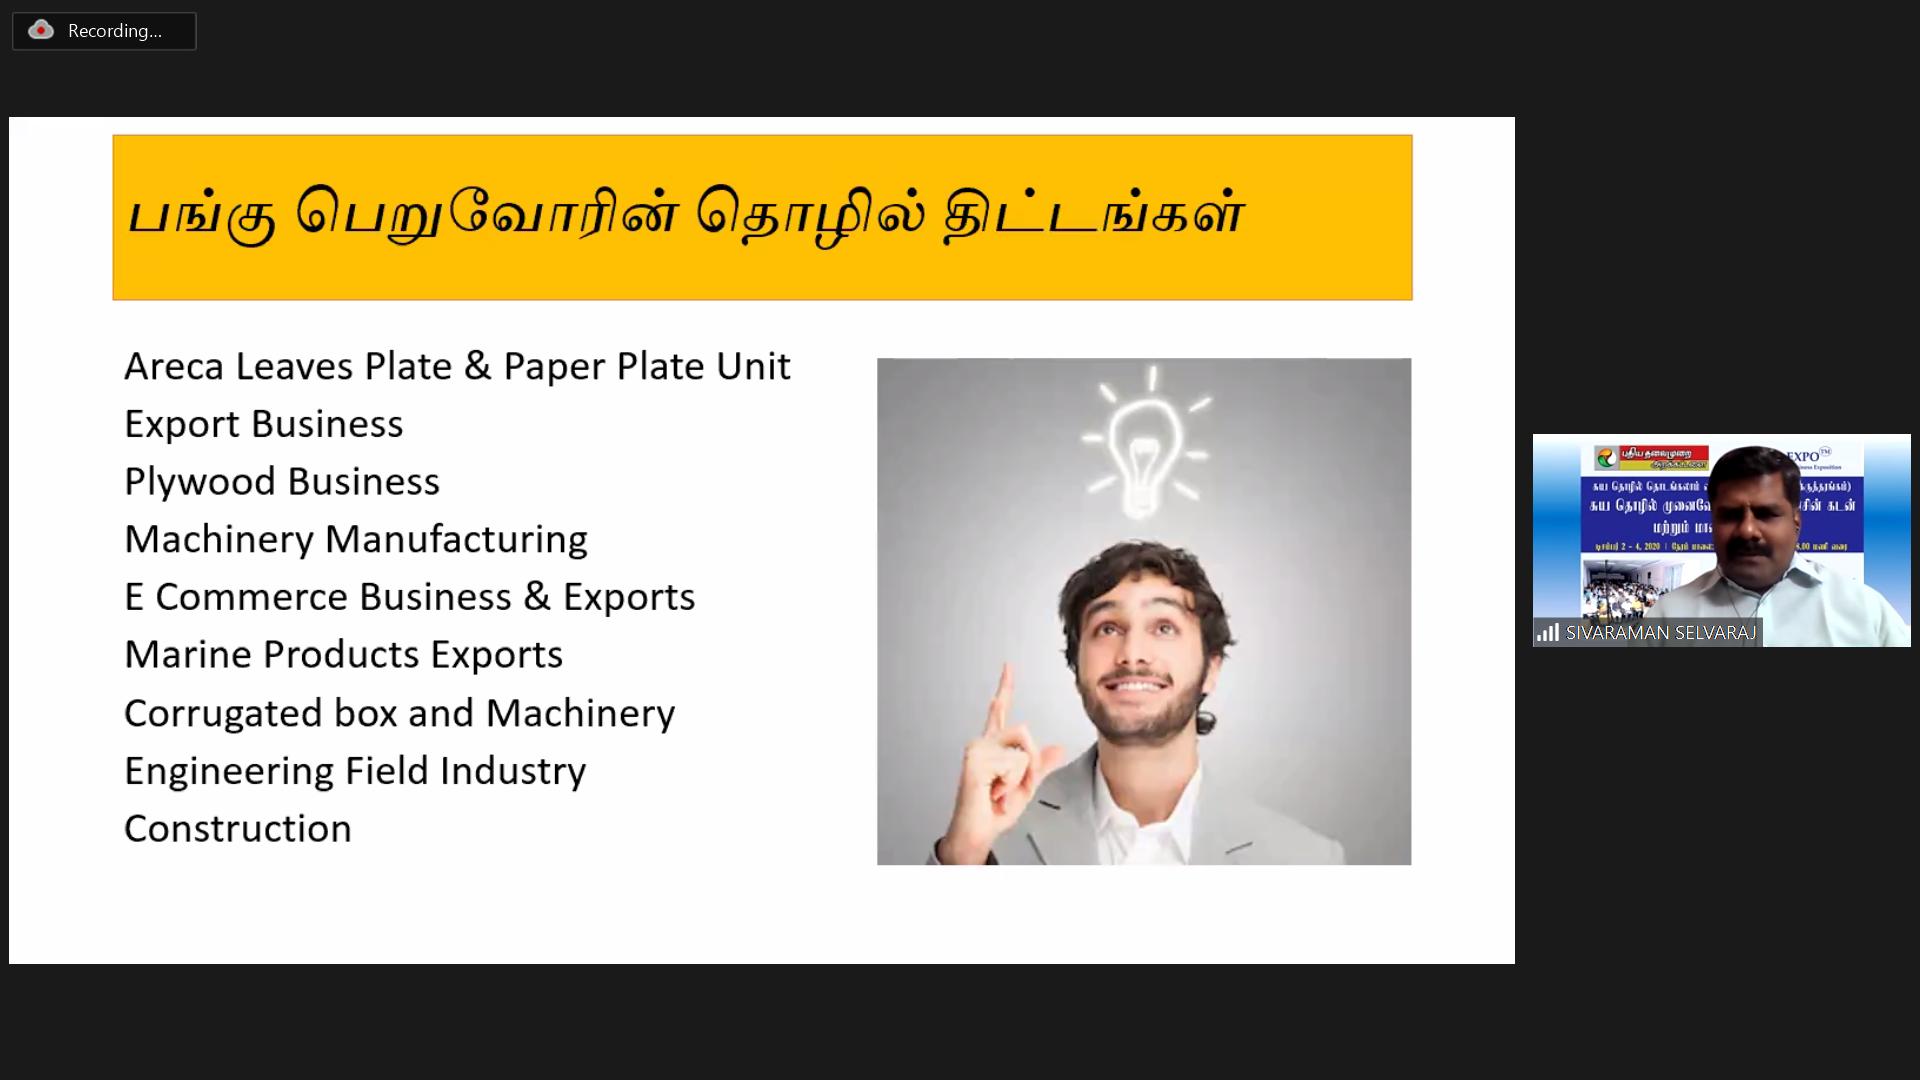 Webinar on Govt. Loan Schemes and Subsidies for Entrepreneurs